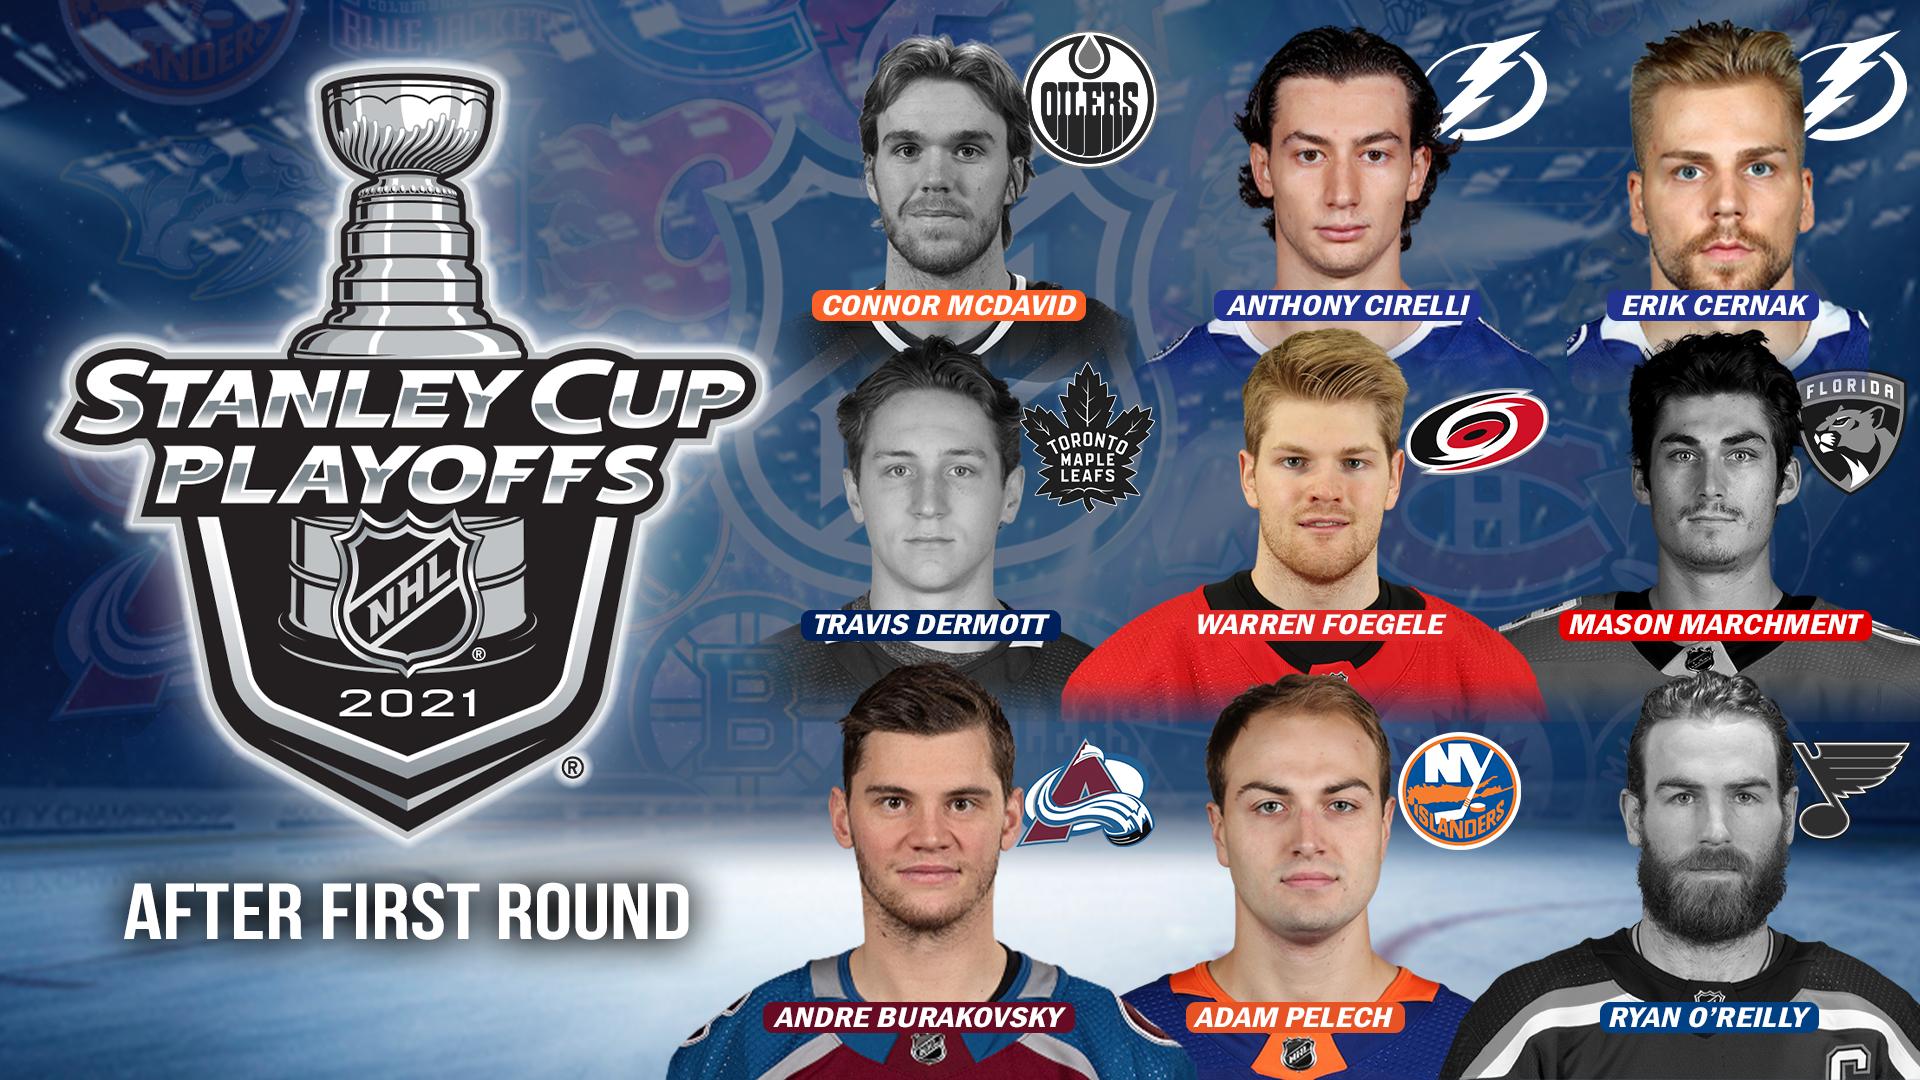 NHL Playoff Alumni Graphic